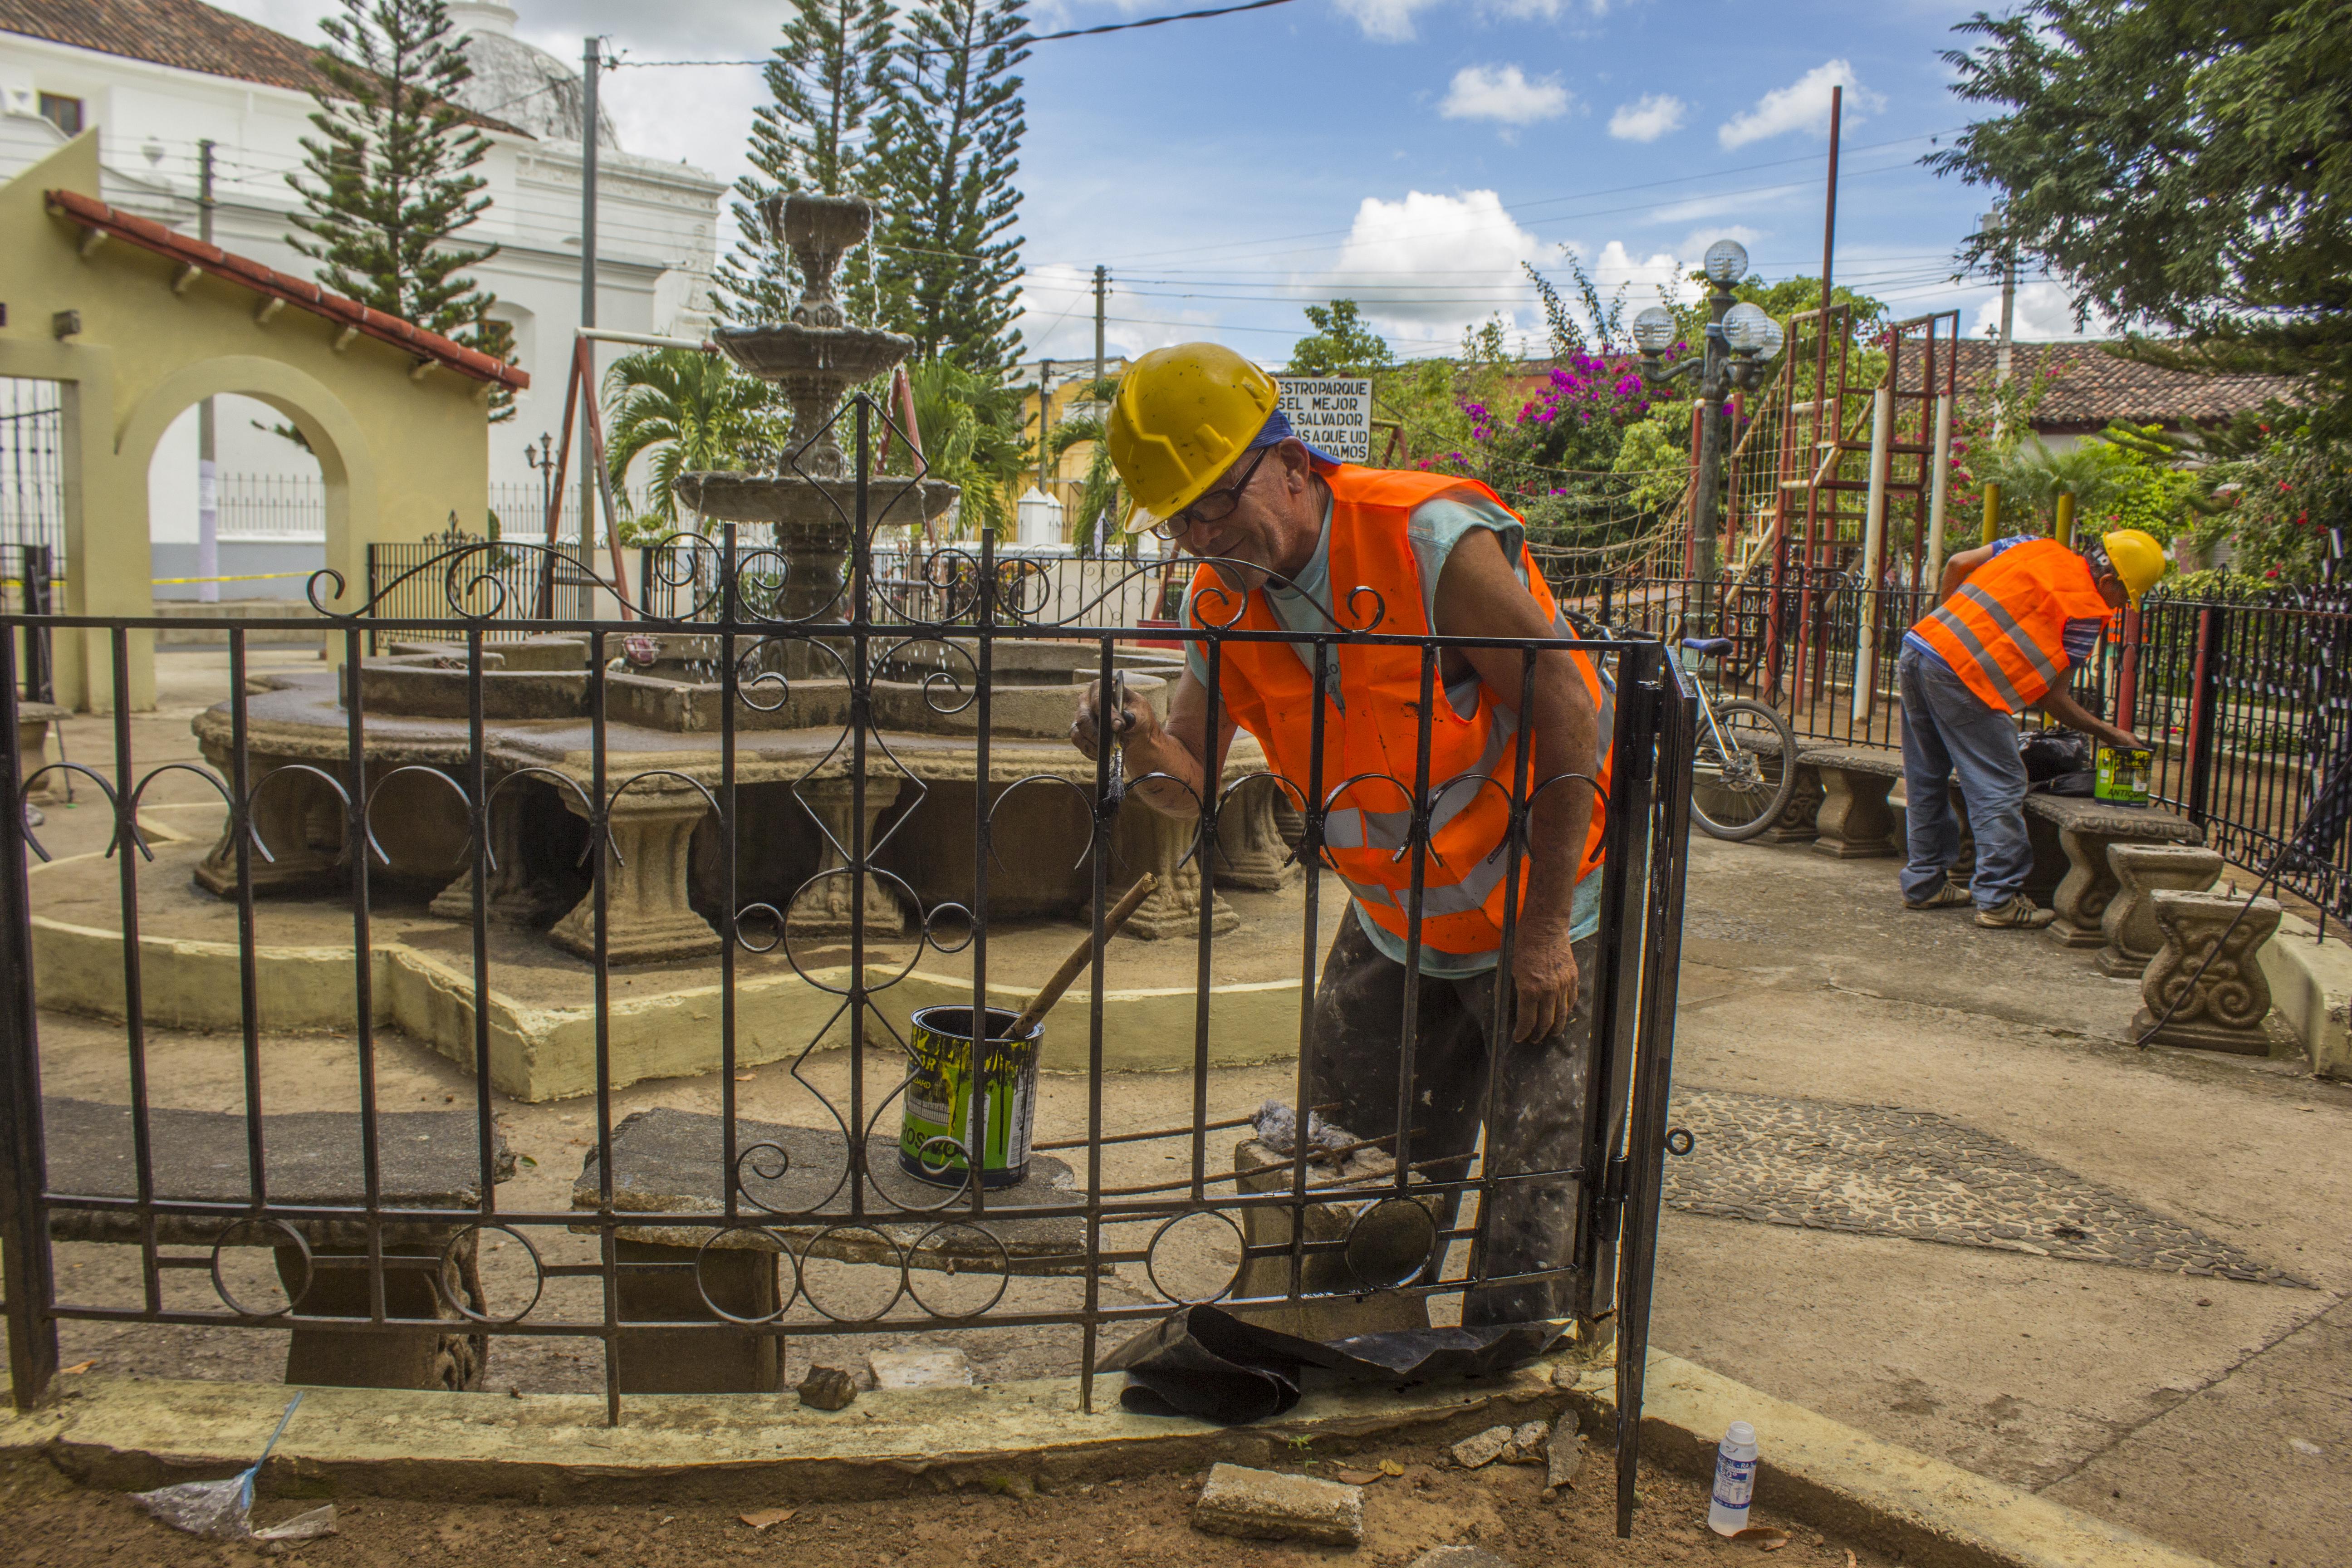 Parques del municipio de Chalchuapa serán remodelados